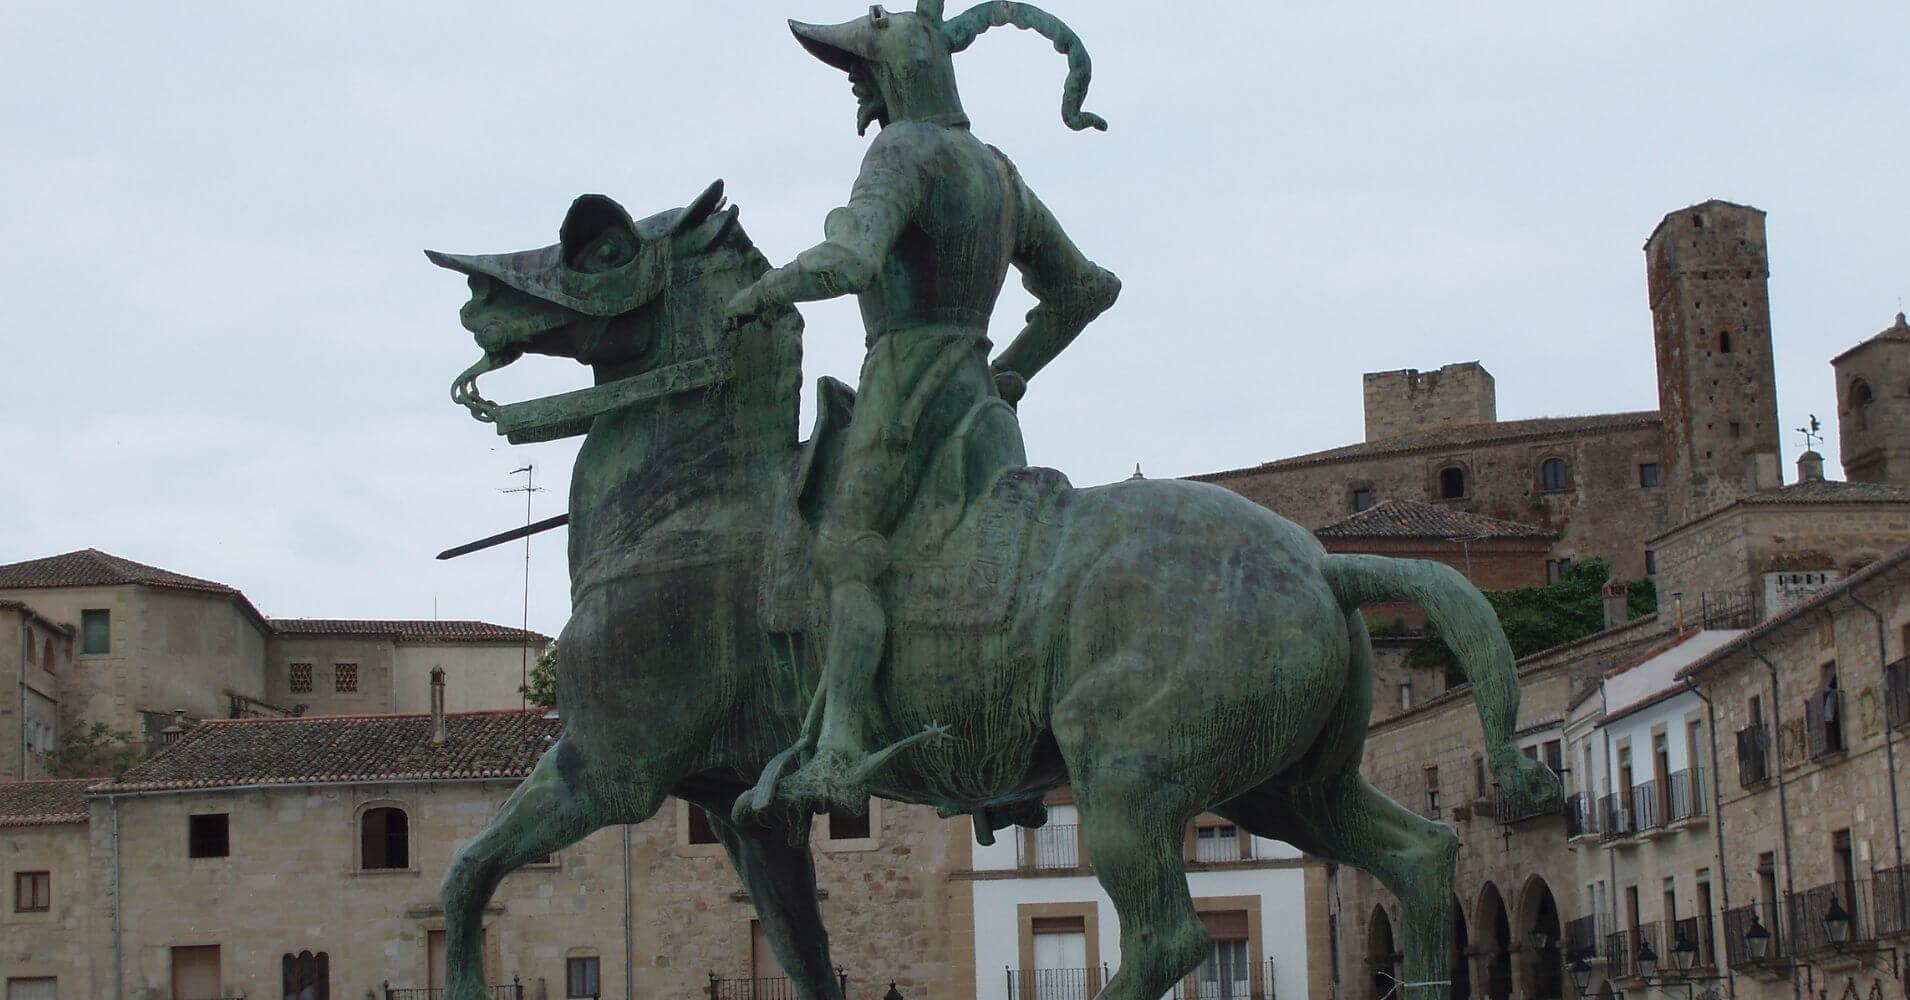 Estatua de Pizarro. Plaza Mayor de Trujillo, Cáceres.